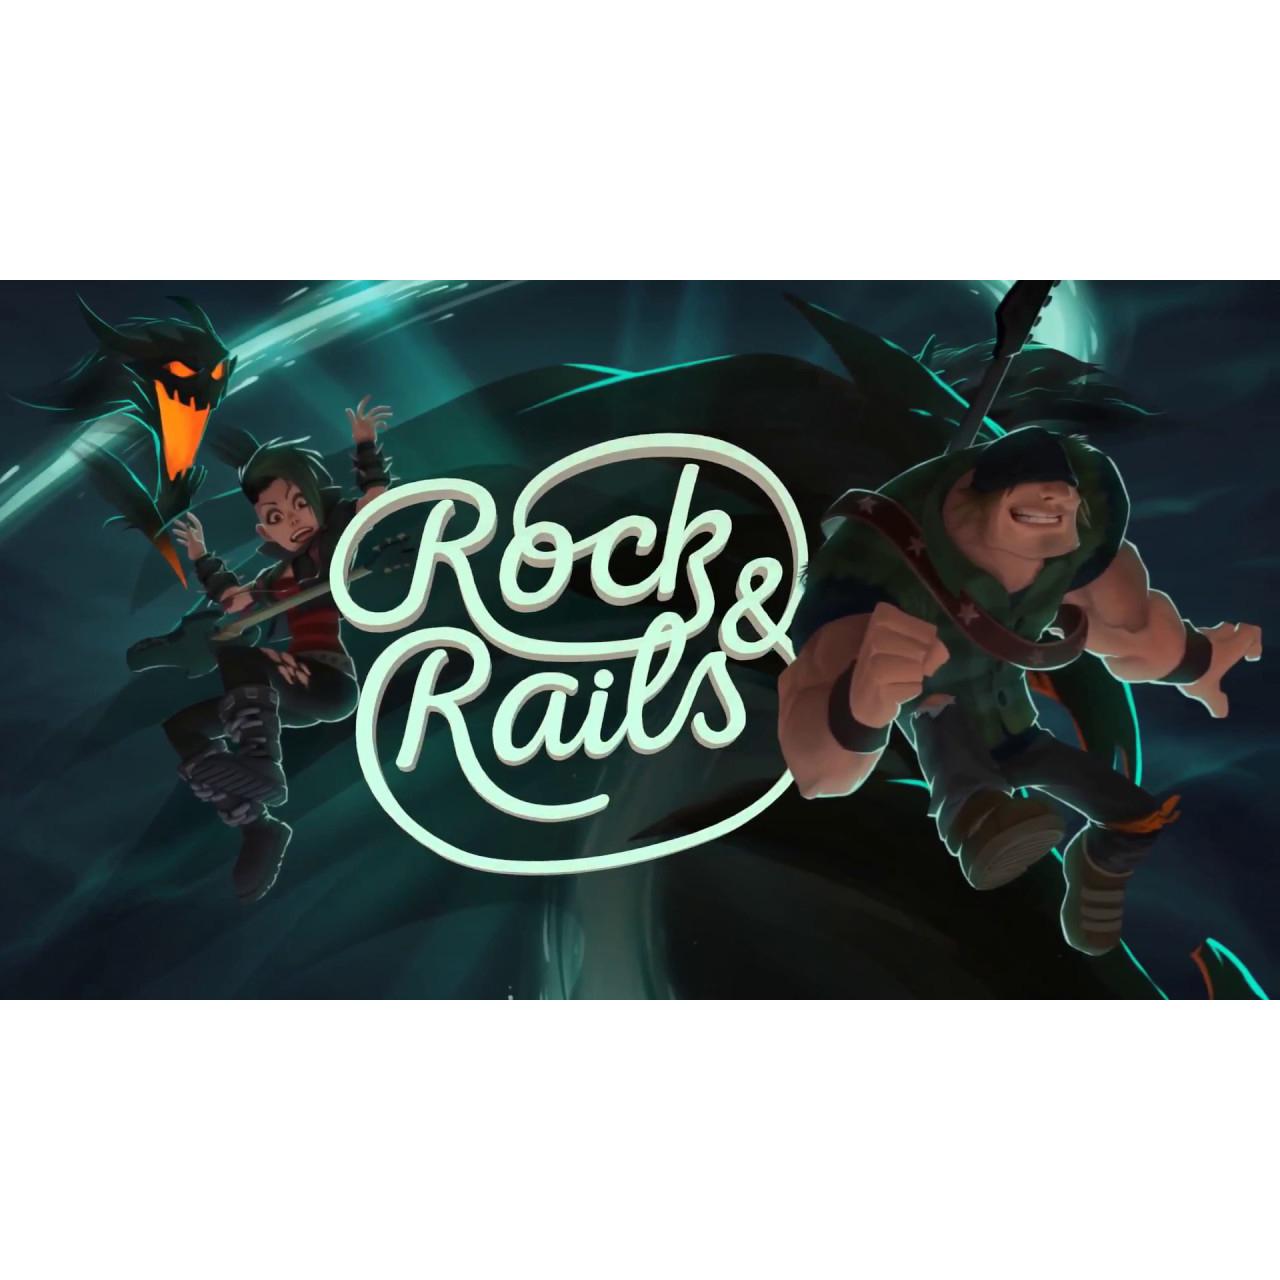 Rock'n' Rails